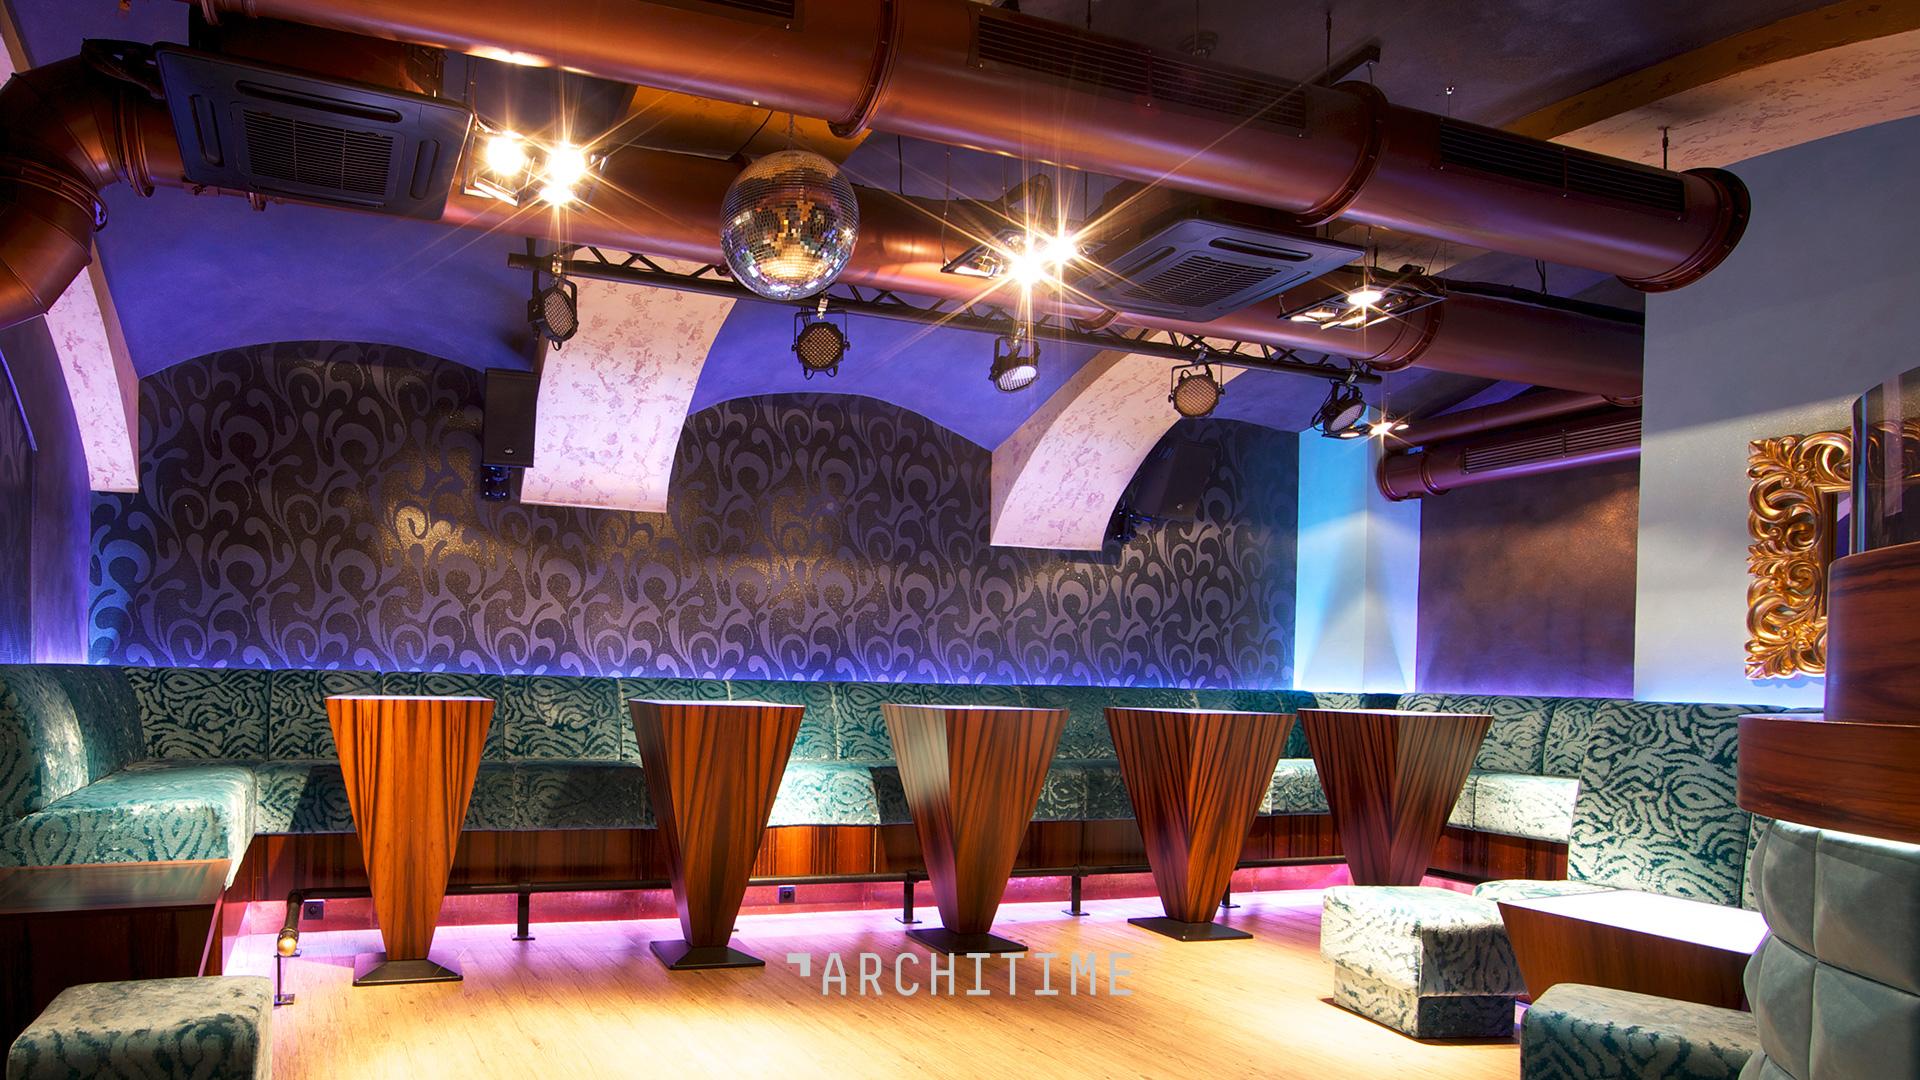 1001 nights club and bar